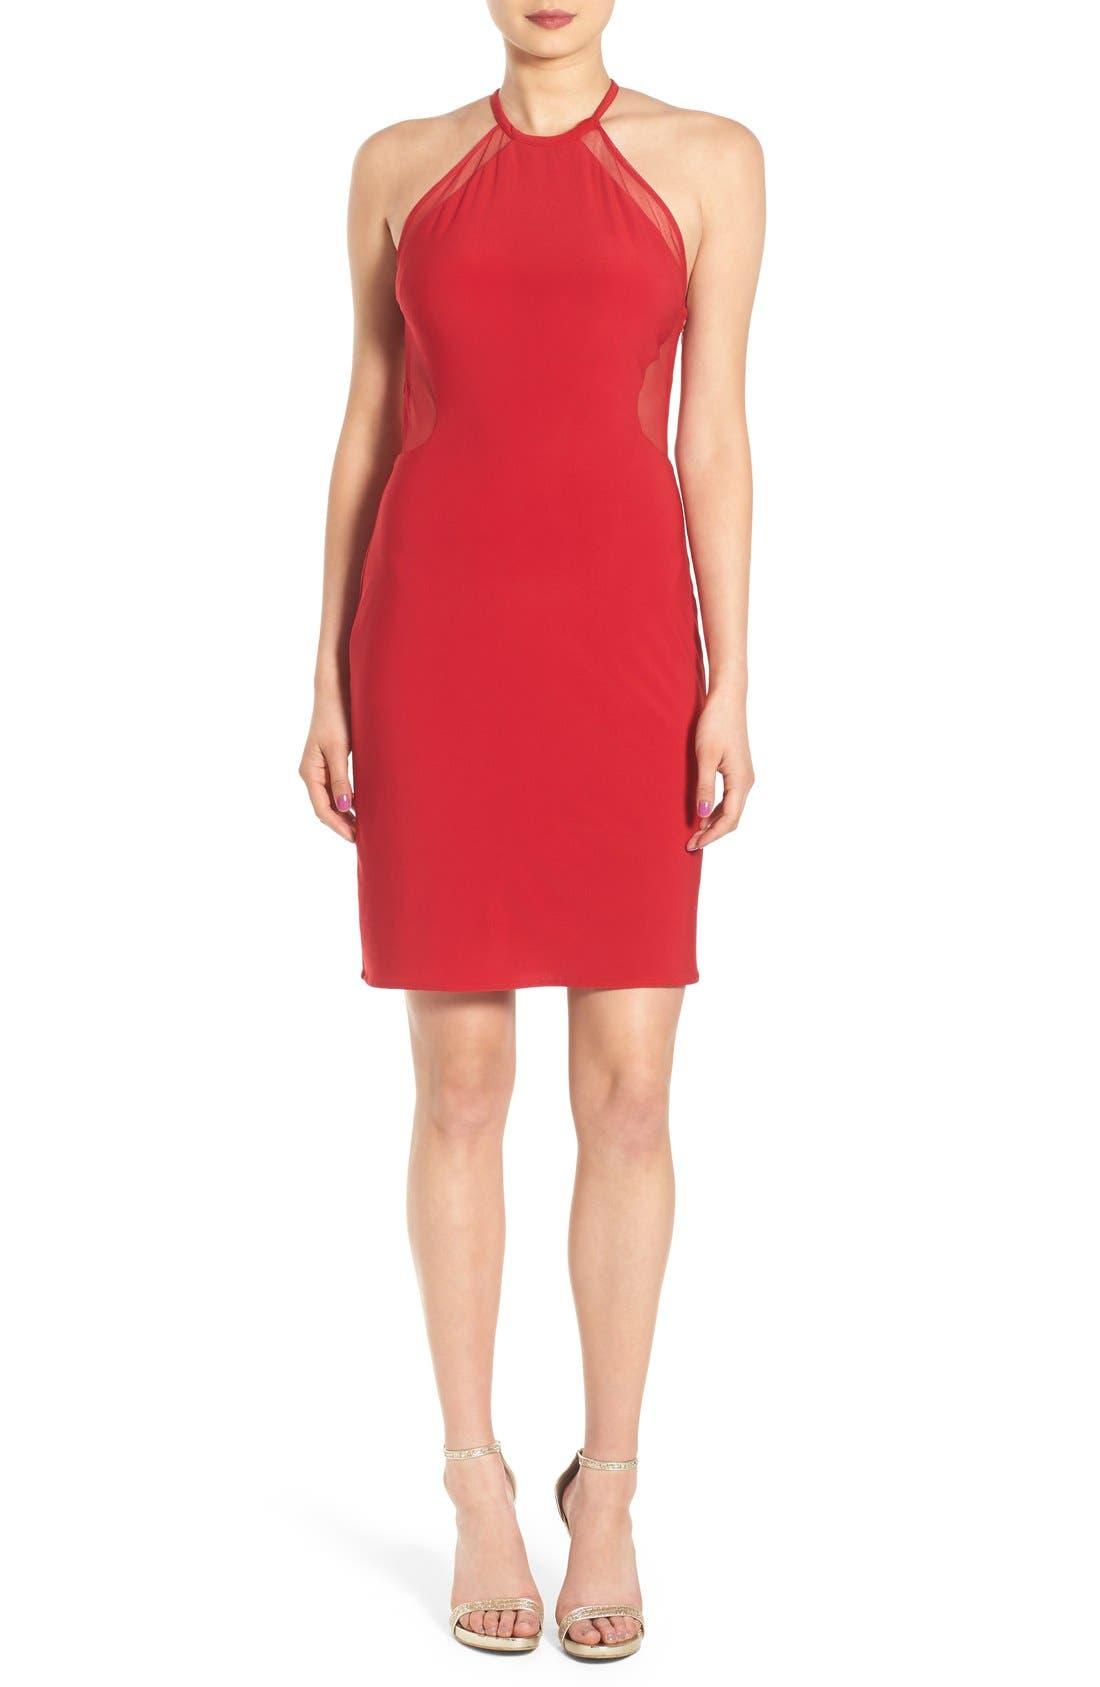 Alternate Image 1 Selected - Morgan & Co Illusion Mesh Body-Con Dress